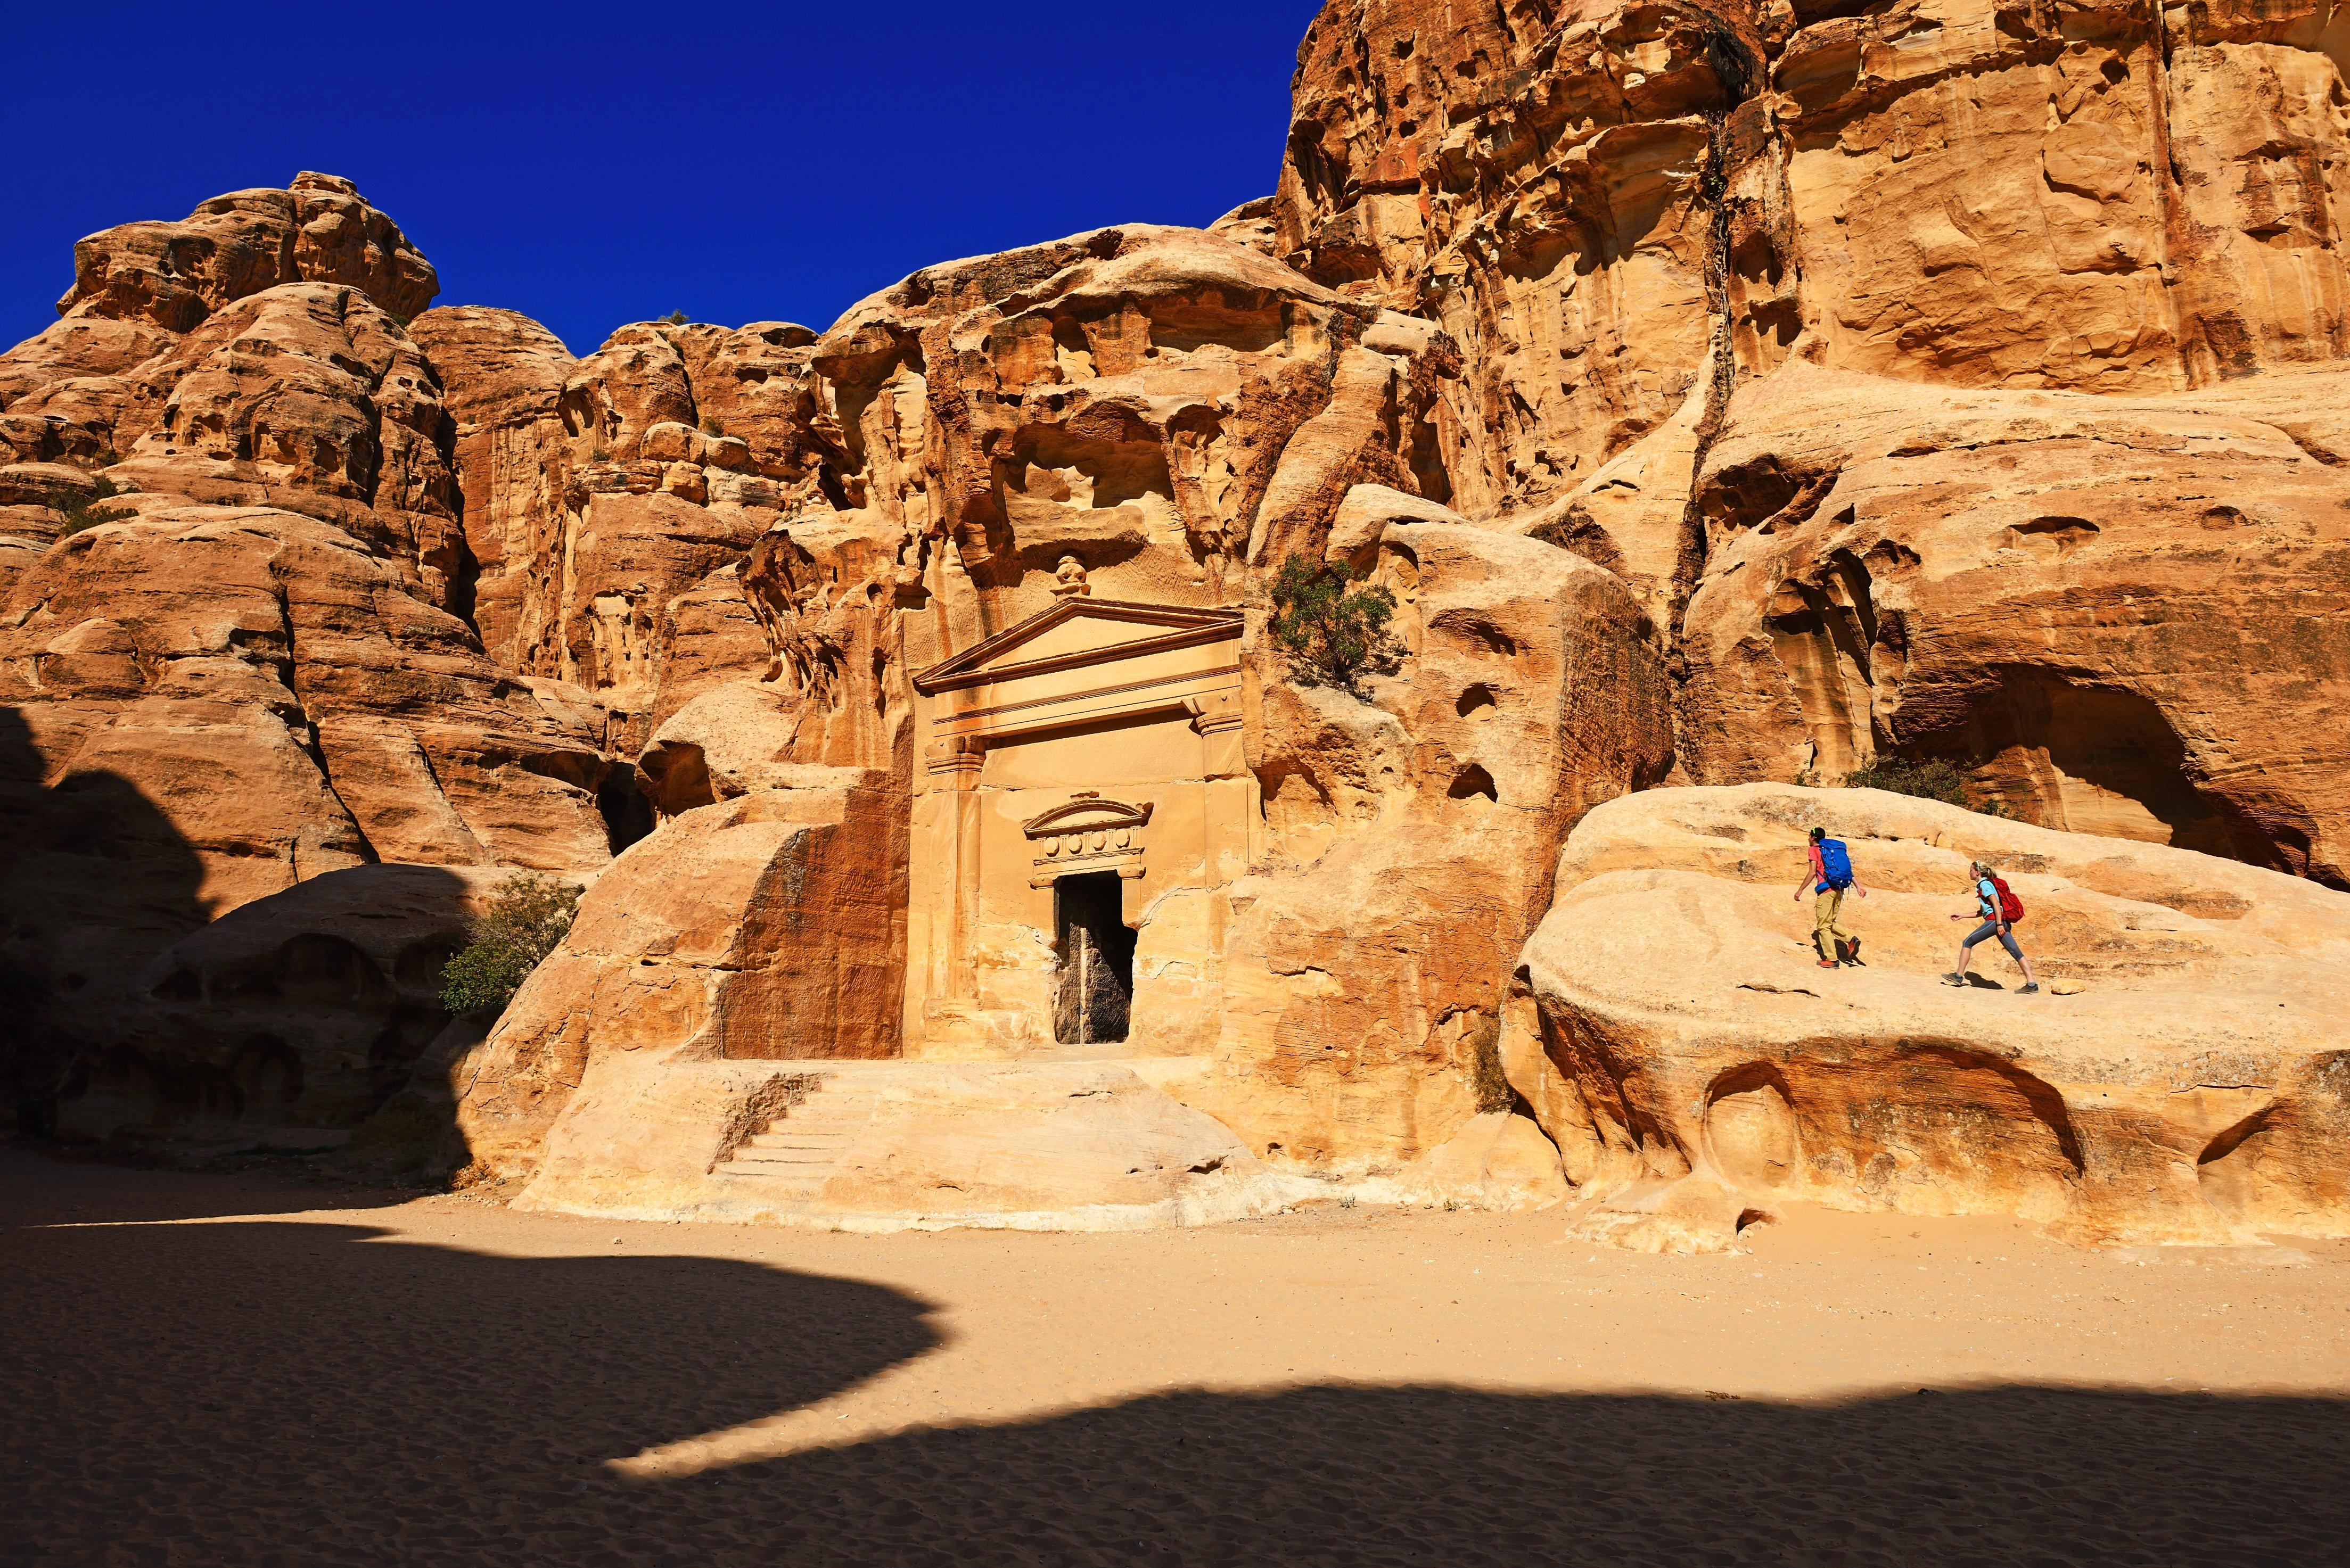 Jordan Trail: A trek through history   CNN Travel